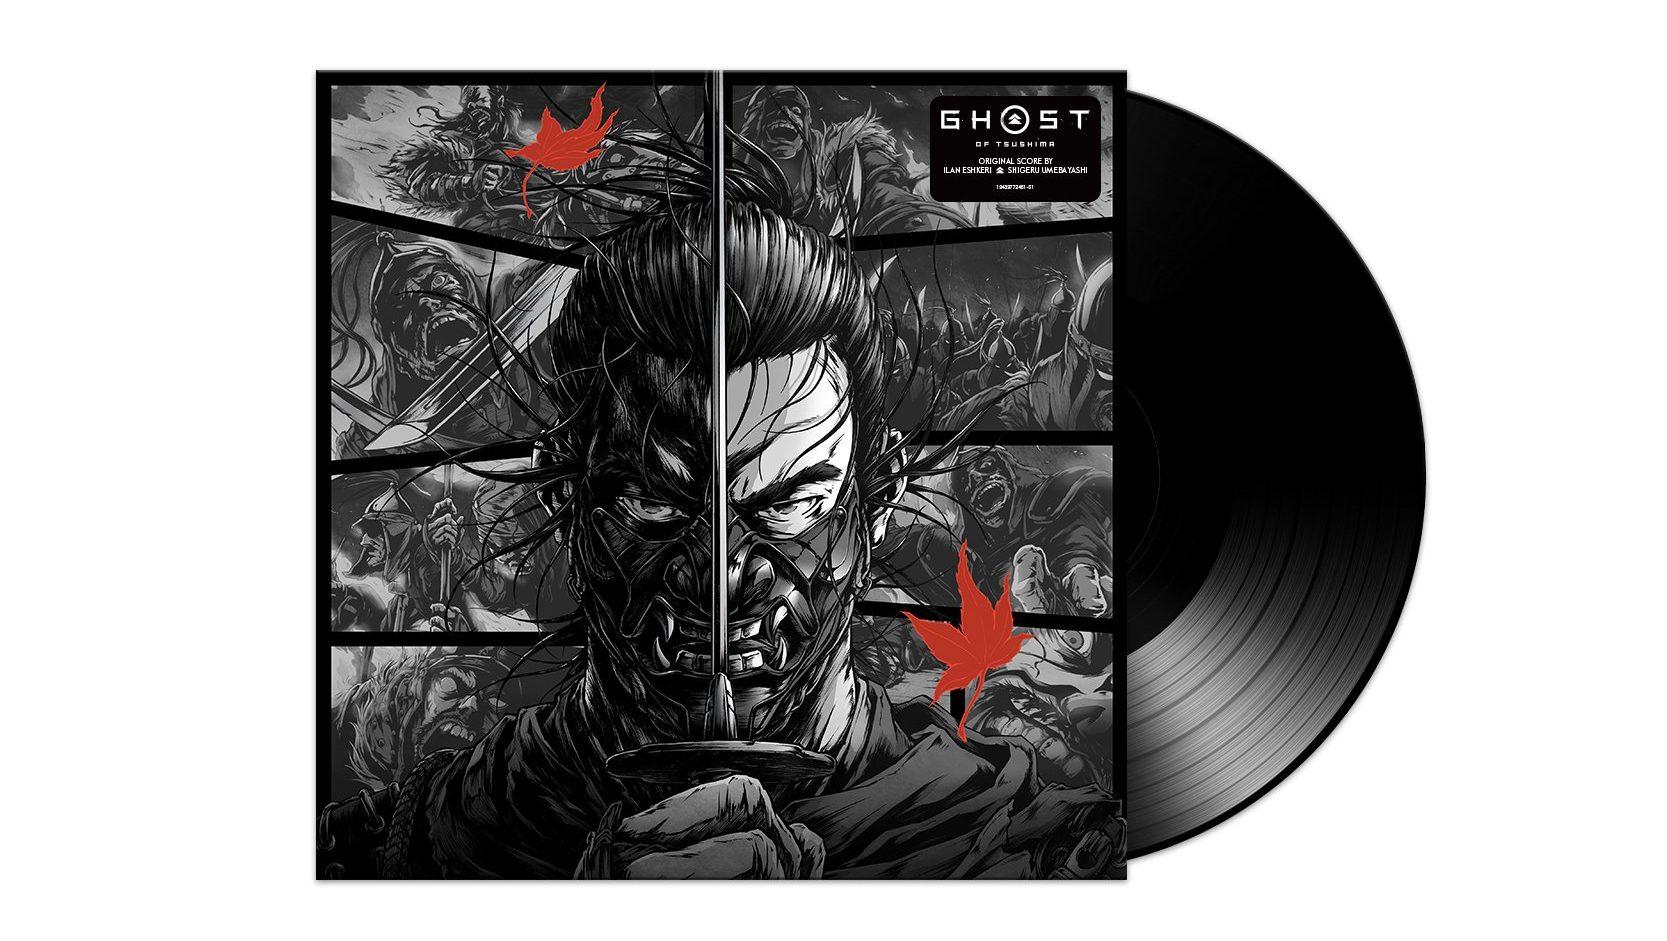 Ghost of Tsushima - 3xLP Vinyl